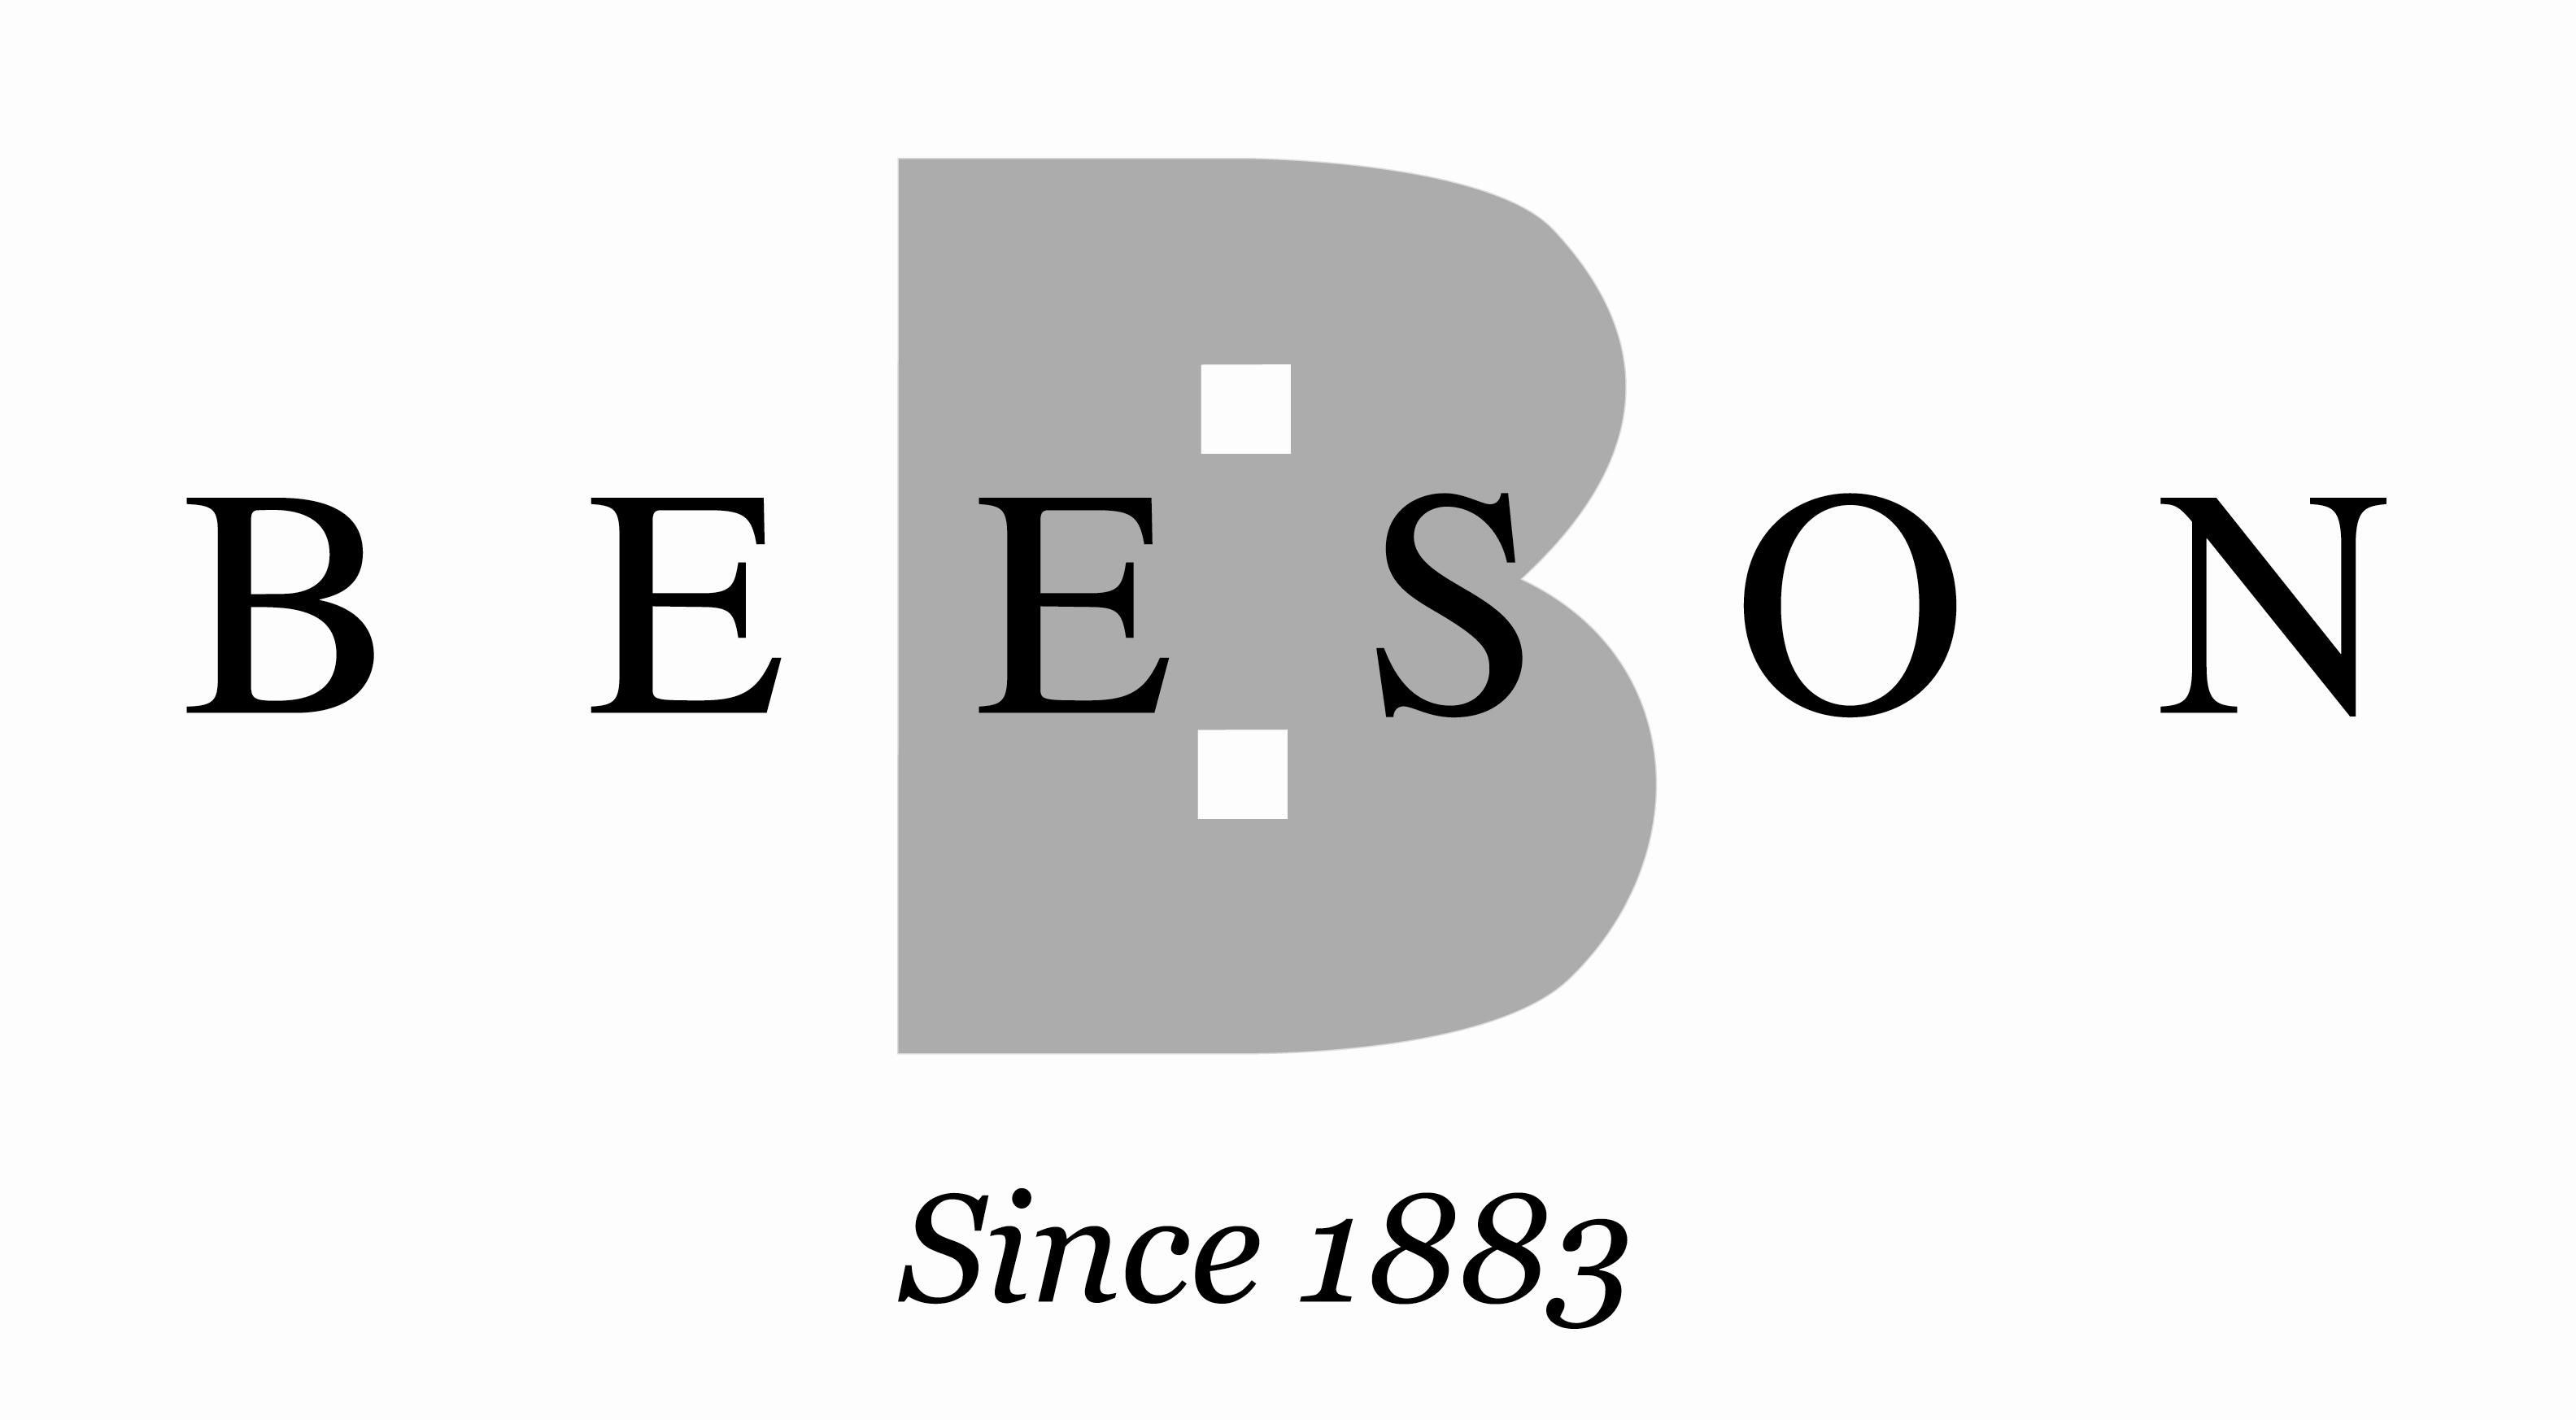 BW-Beeson-Logo-2-1